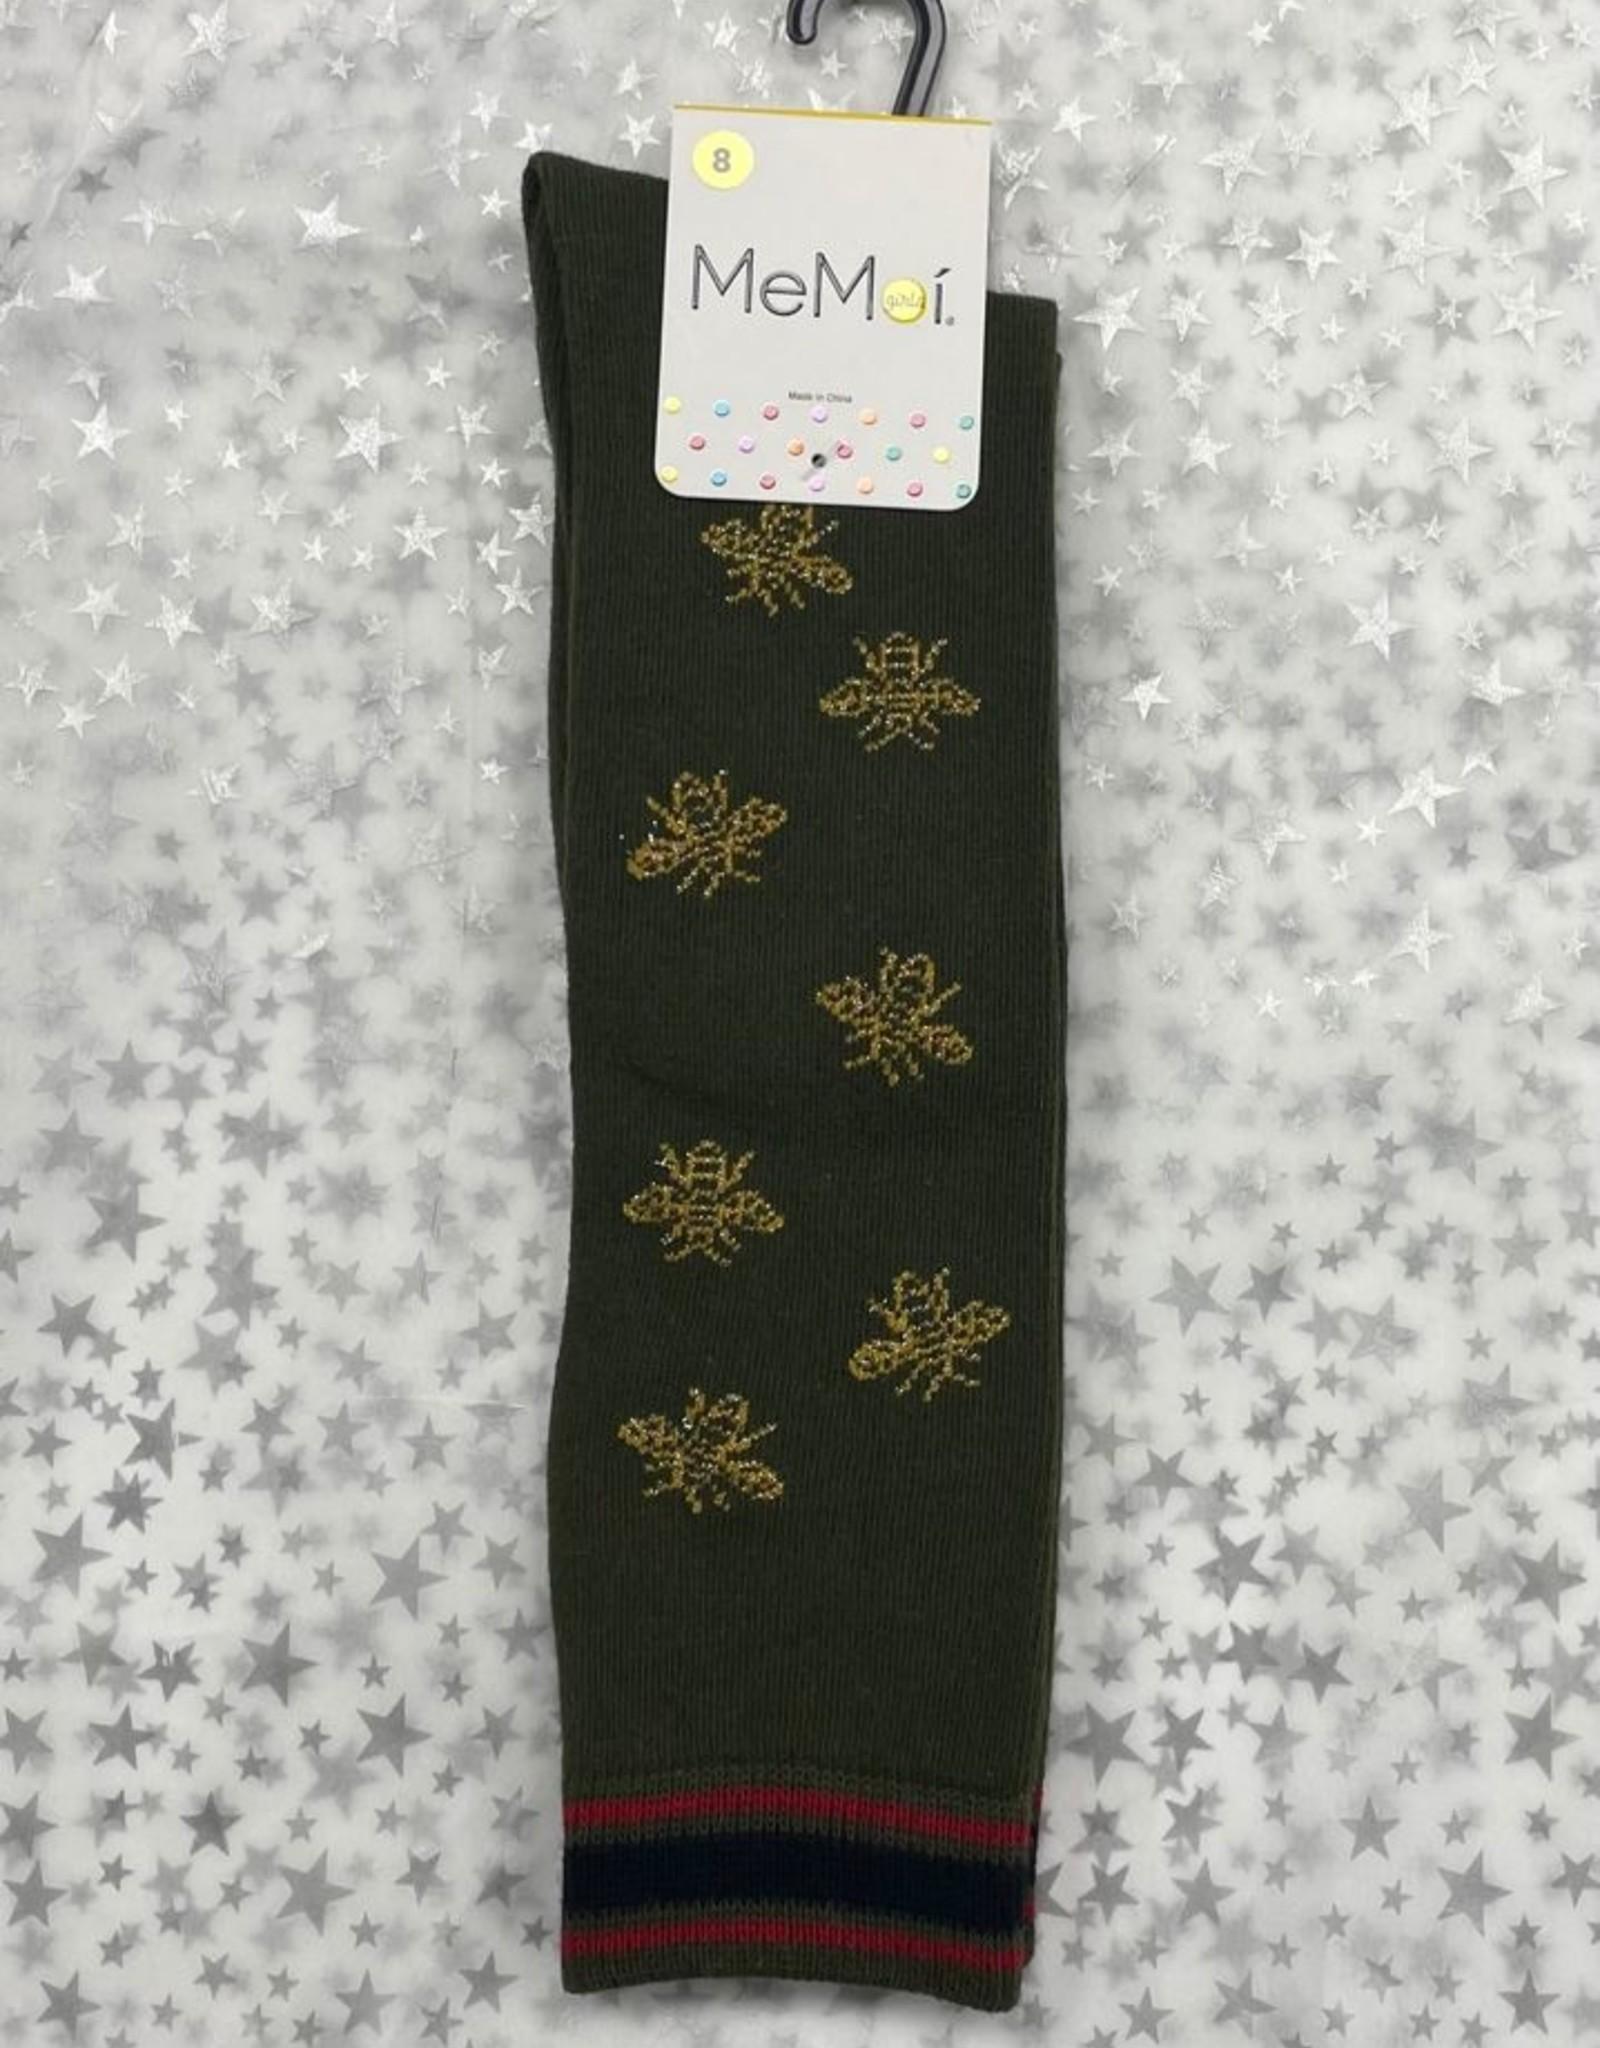 Memoi Memoi Striped Bee Knee Sock